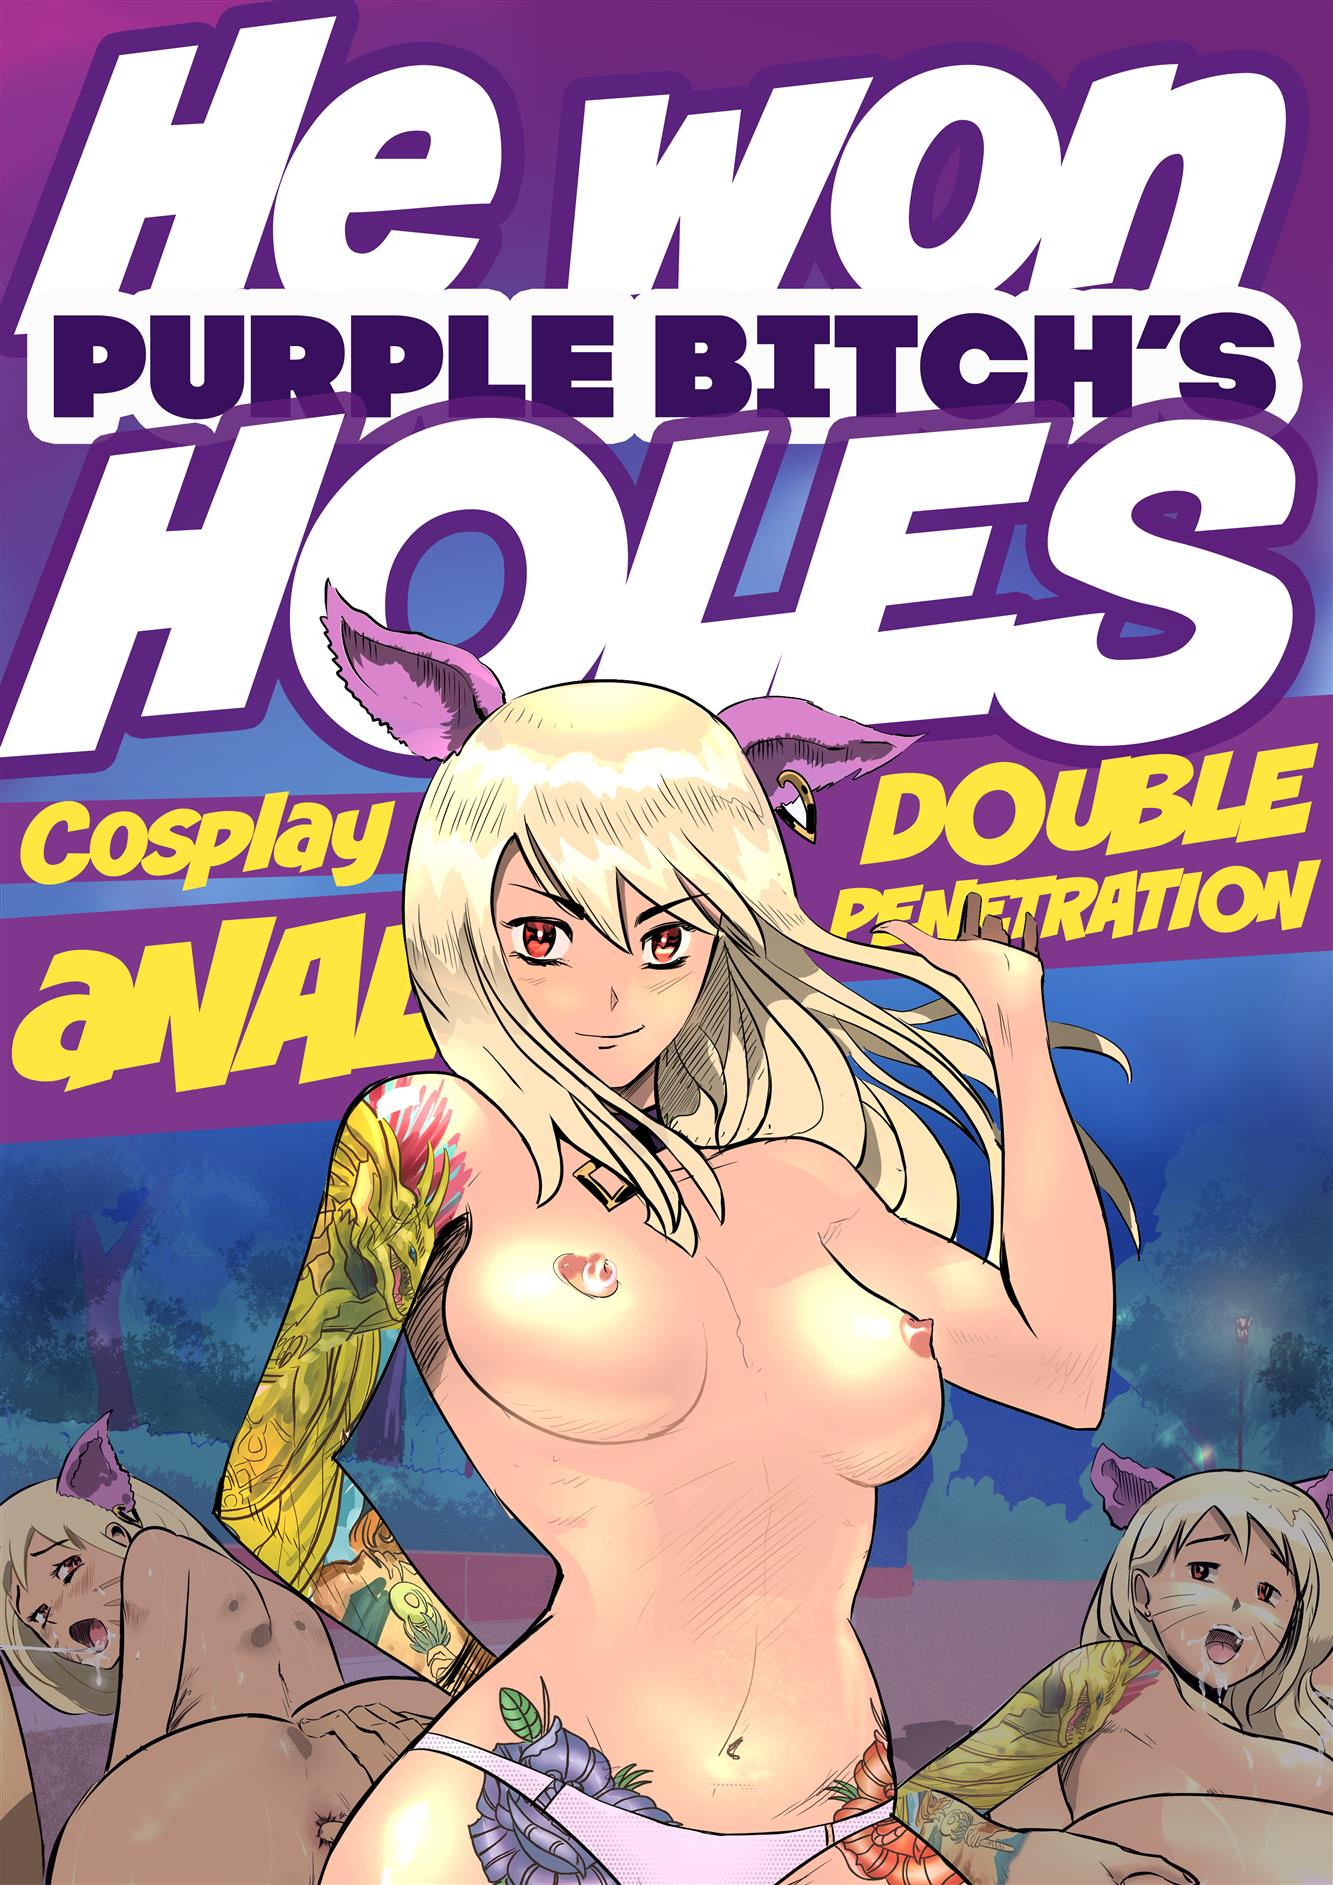 Purple Bitch Hentai